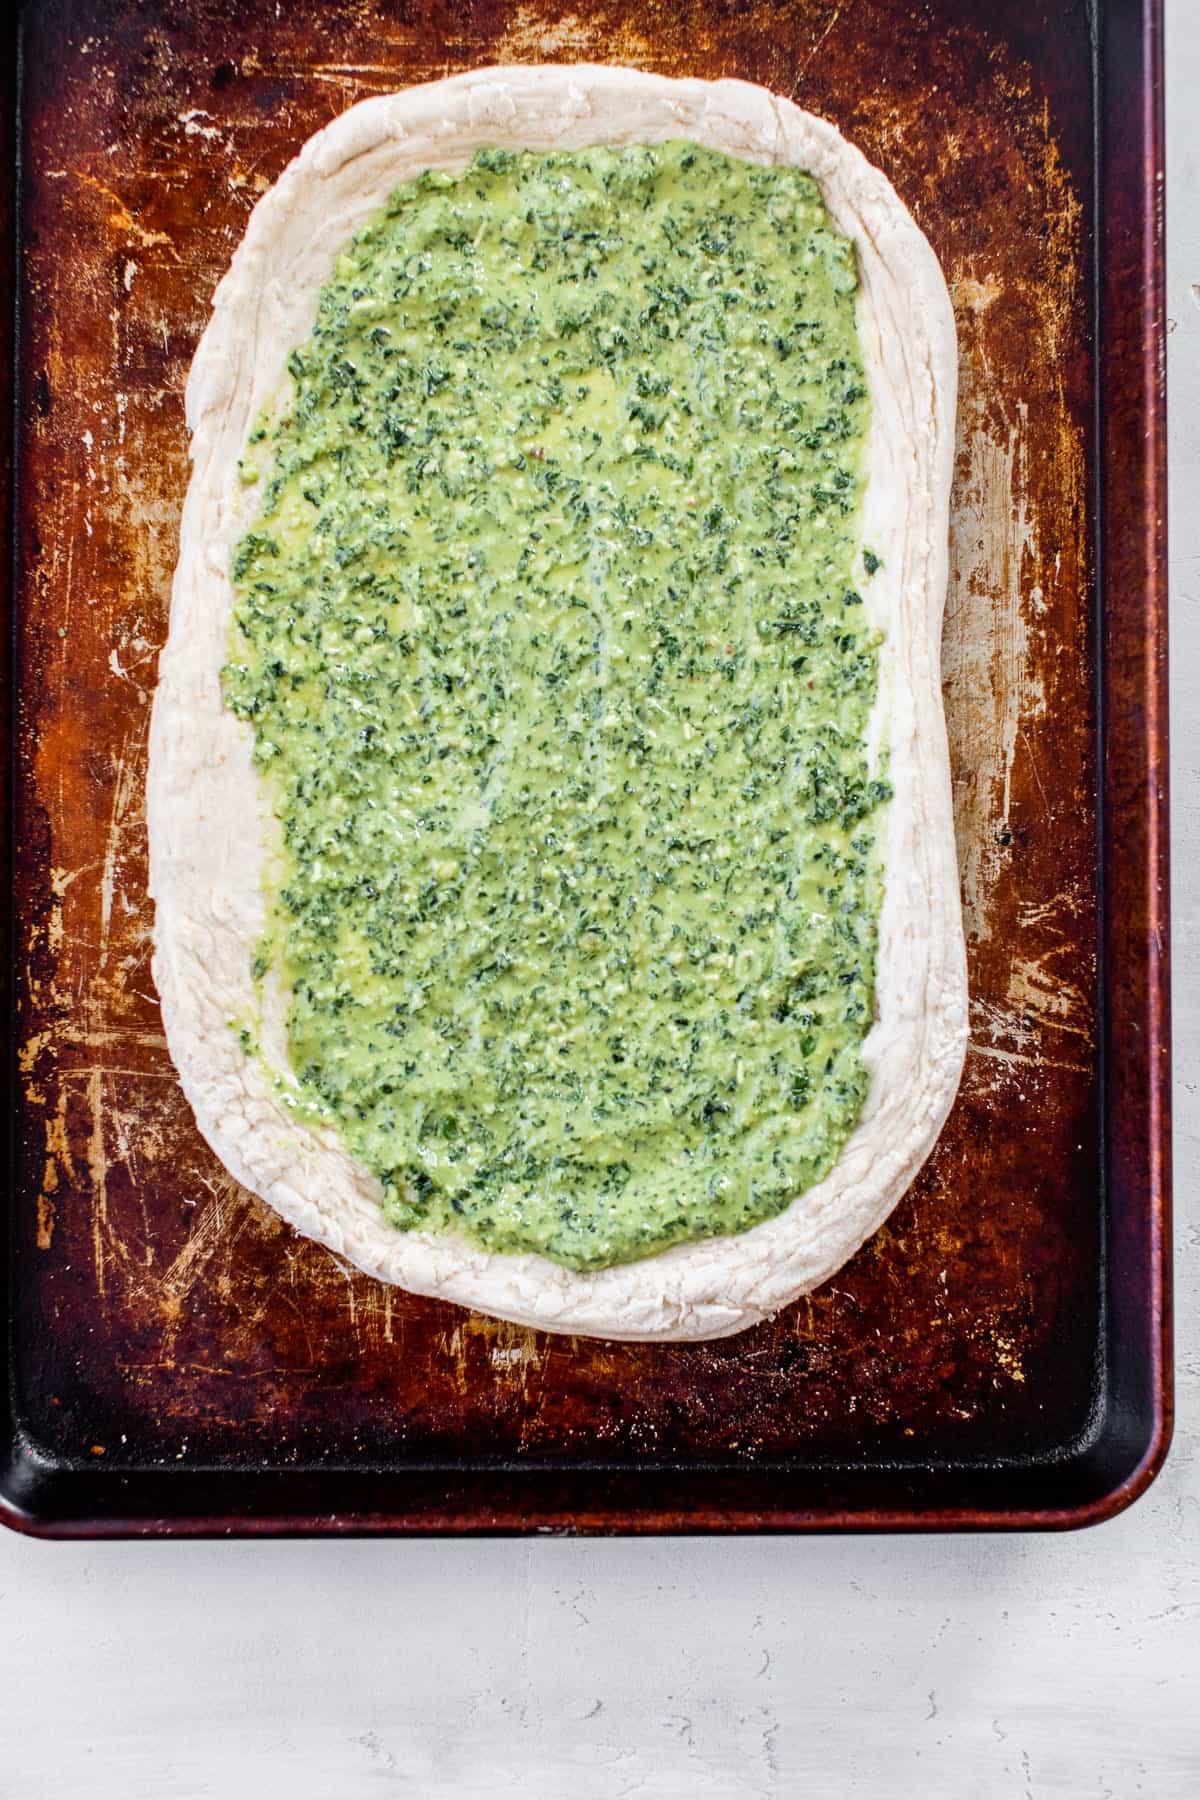 unbaked pesto pizza dough on a baking sheet